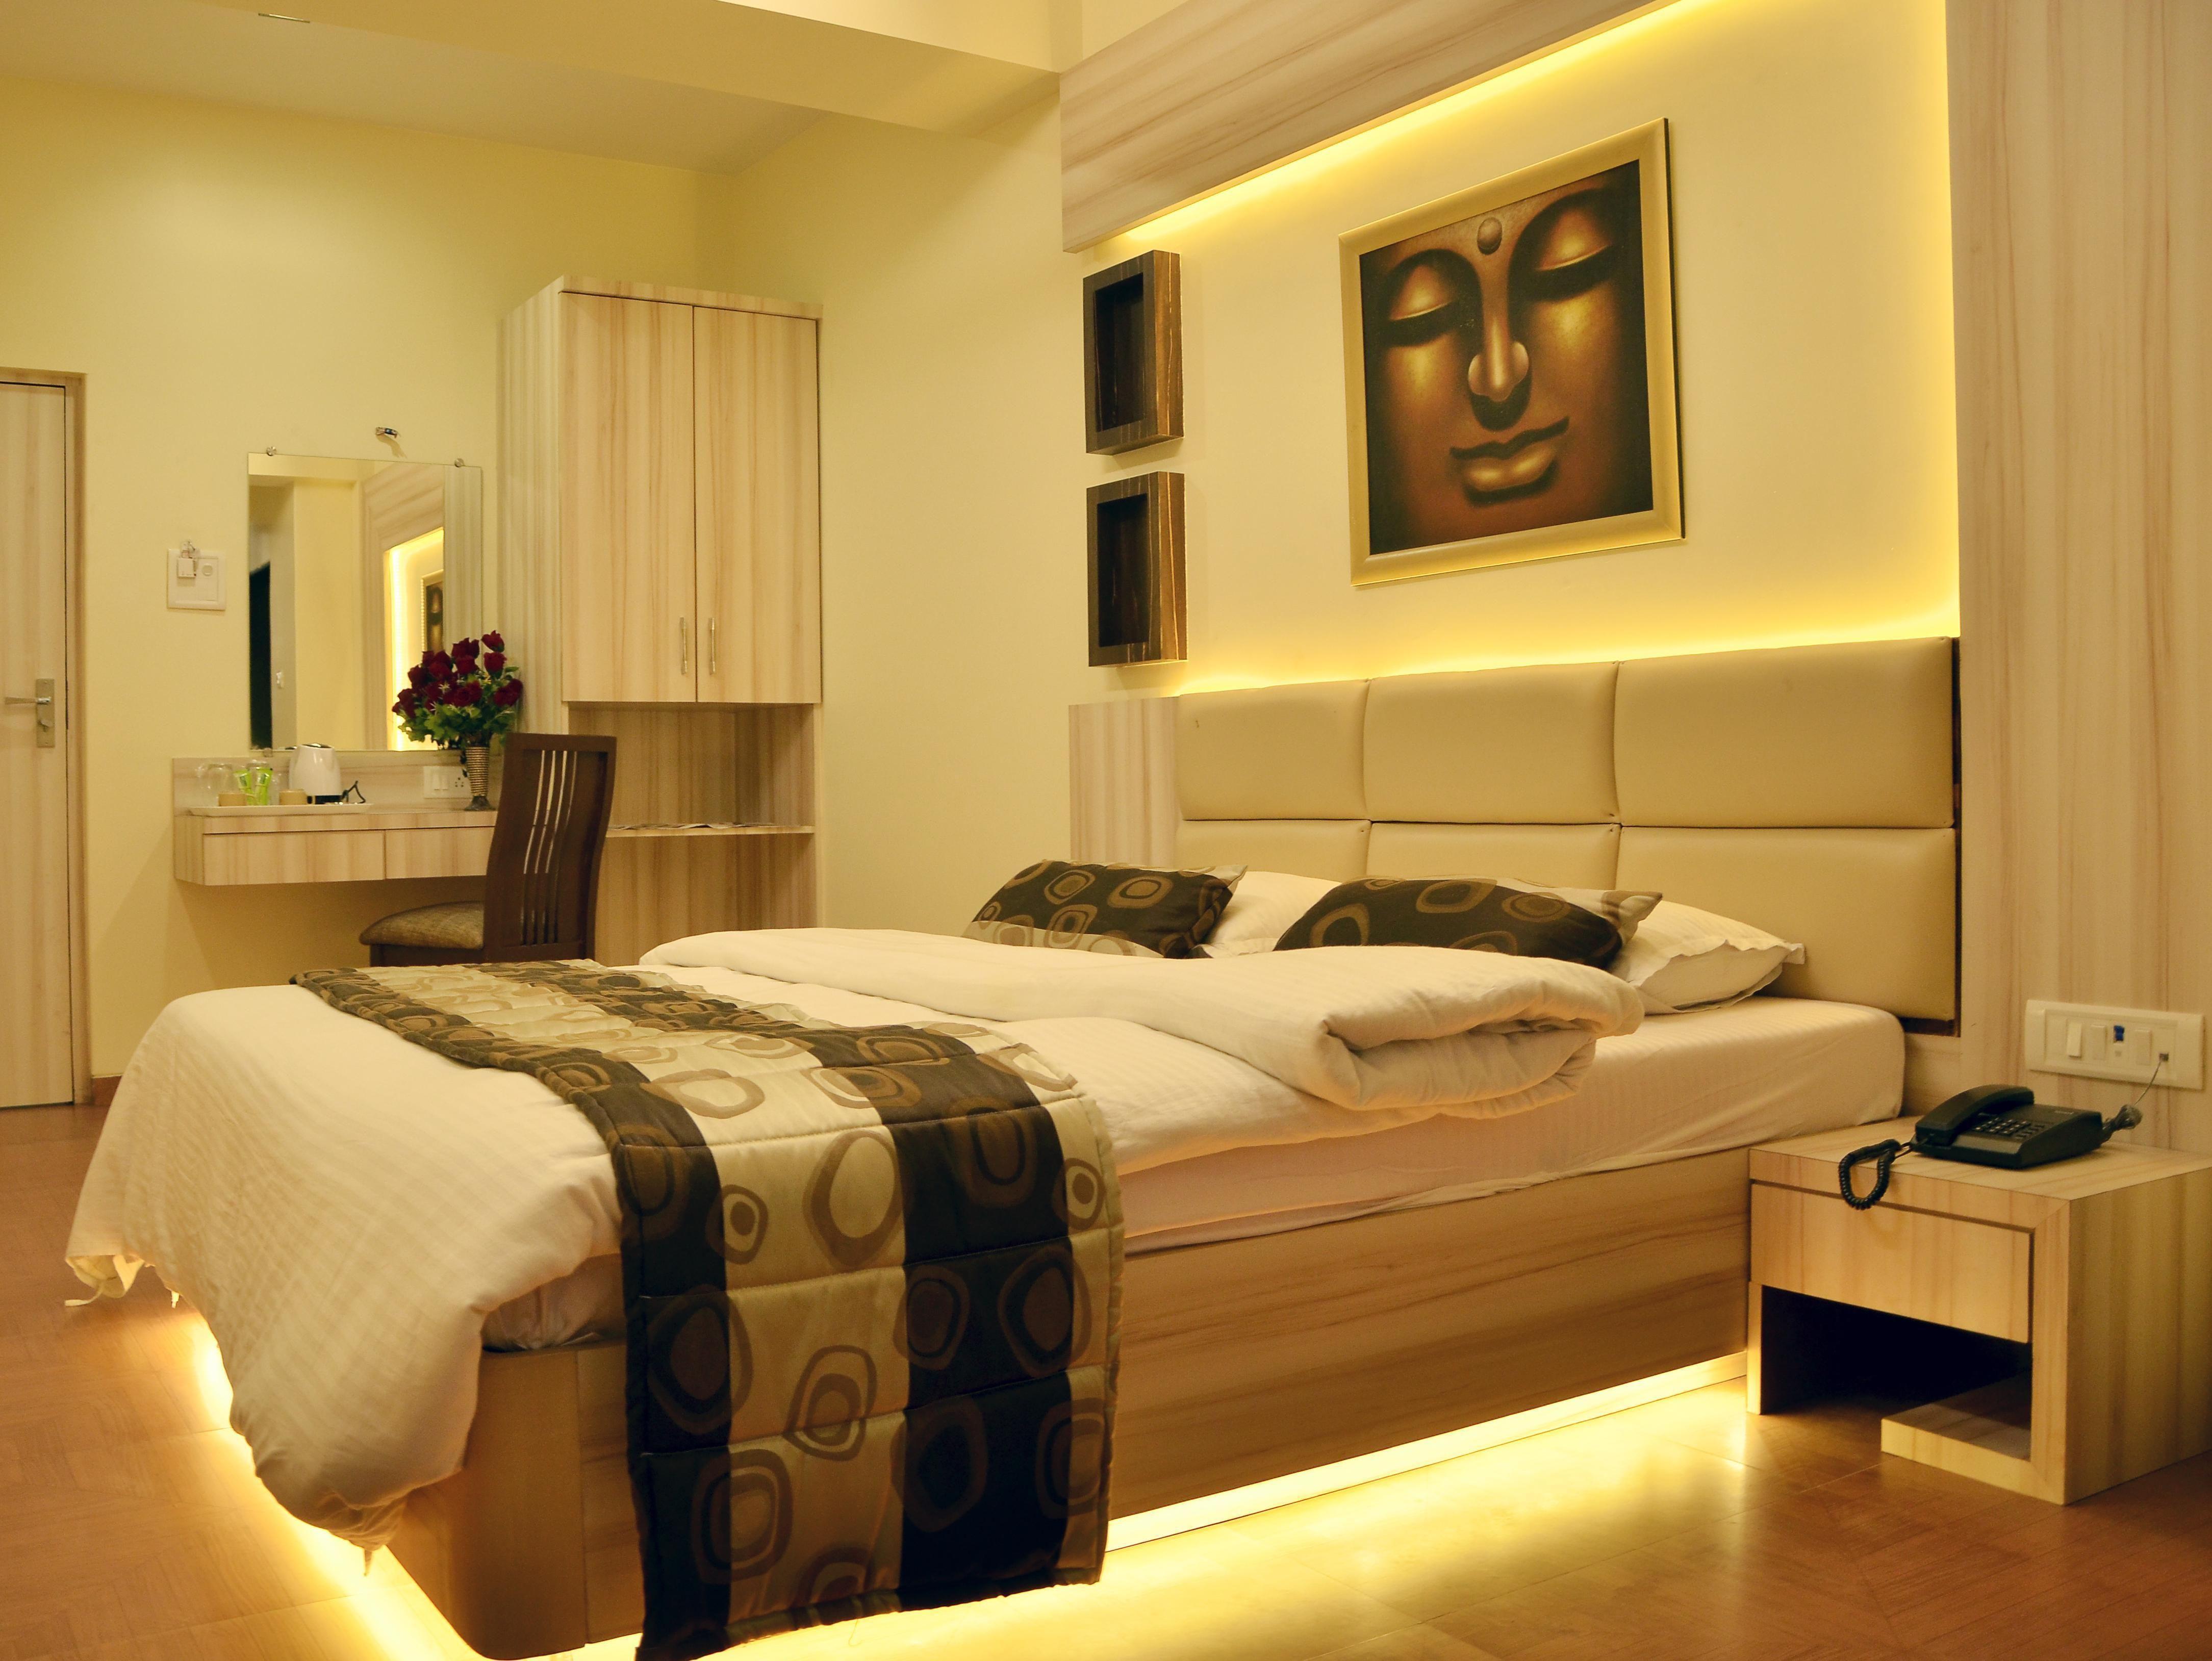 Hotel Prime Residency Mumbai Hotel Alka Residency India Asia Set In A Prime Location Of